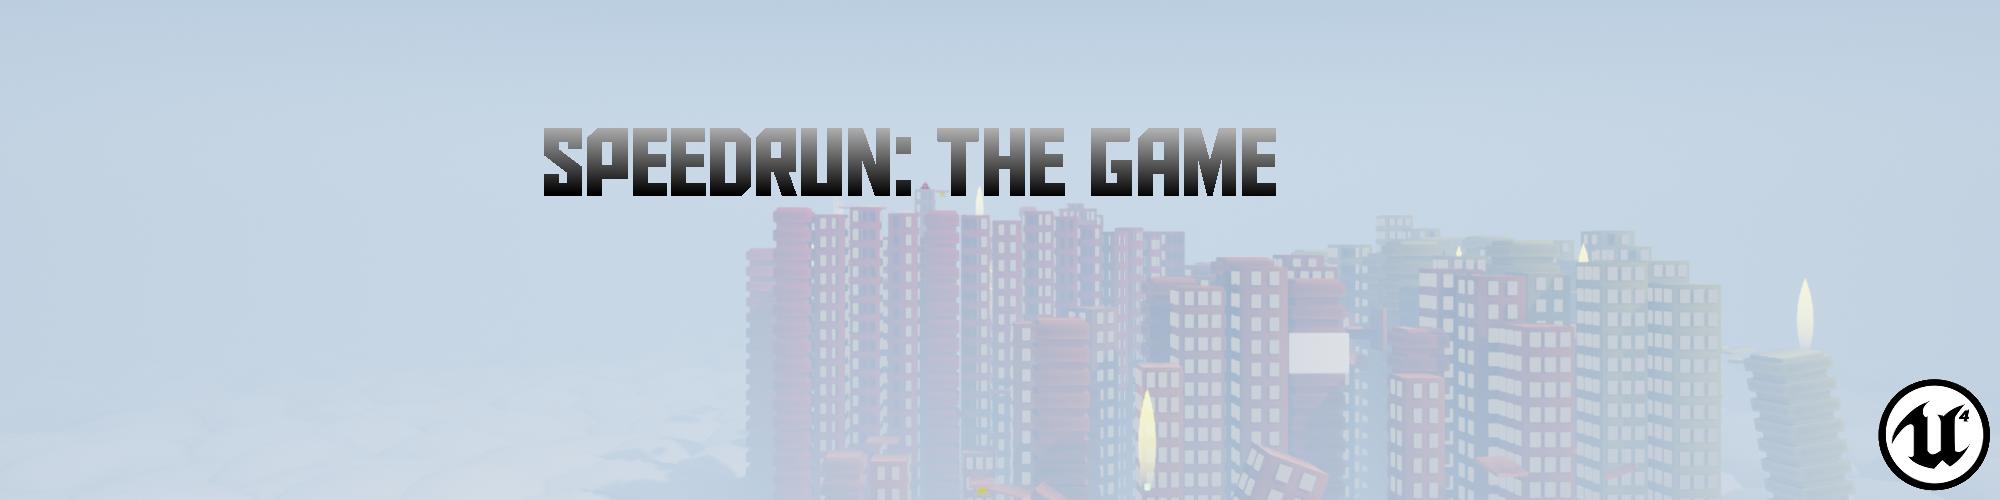 Speedrun: The Game